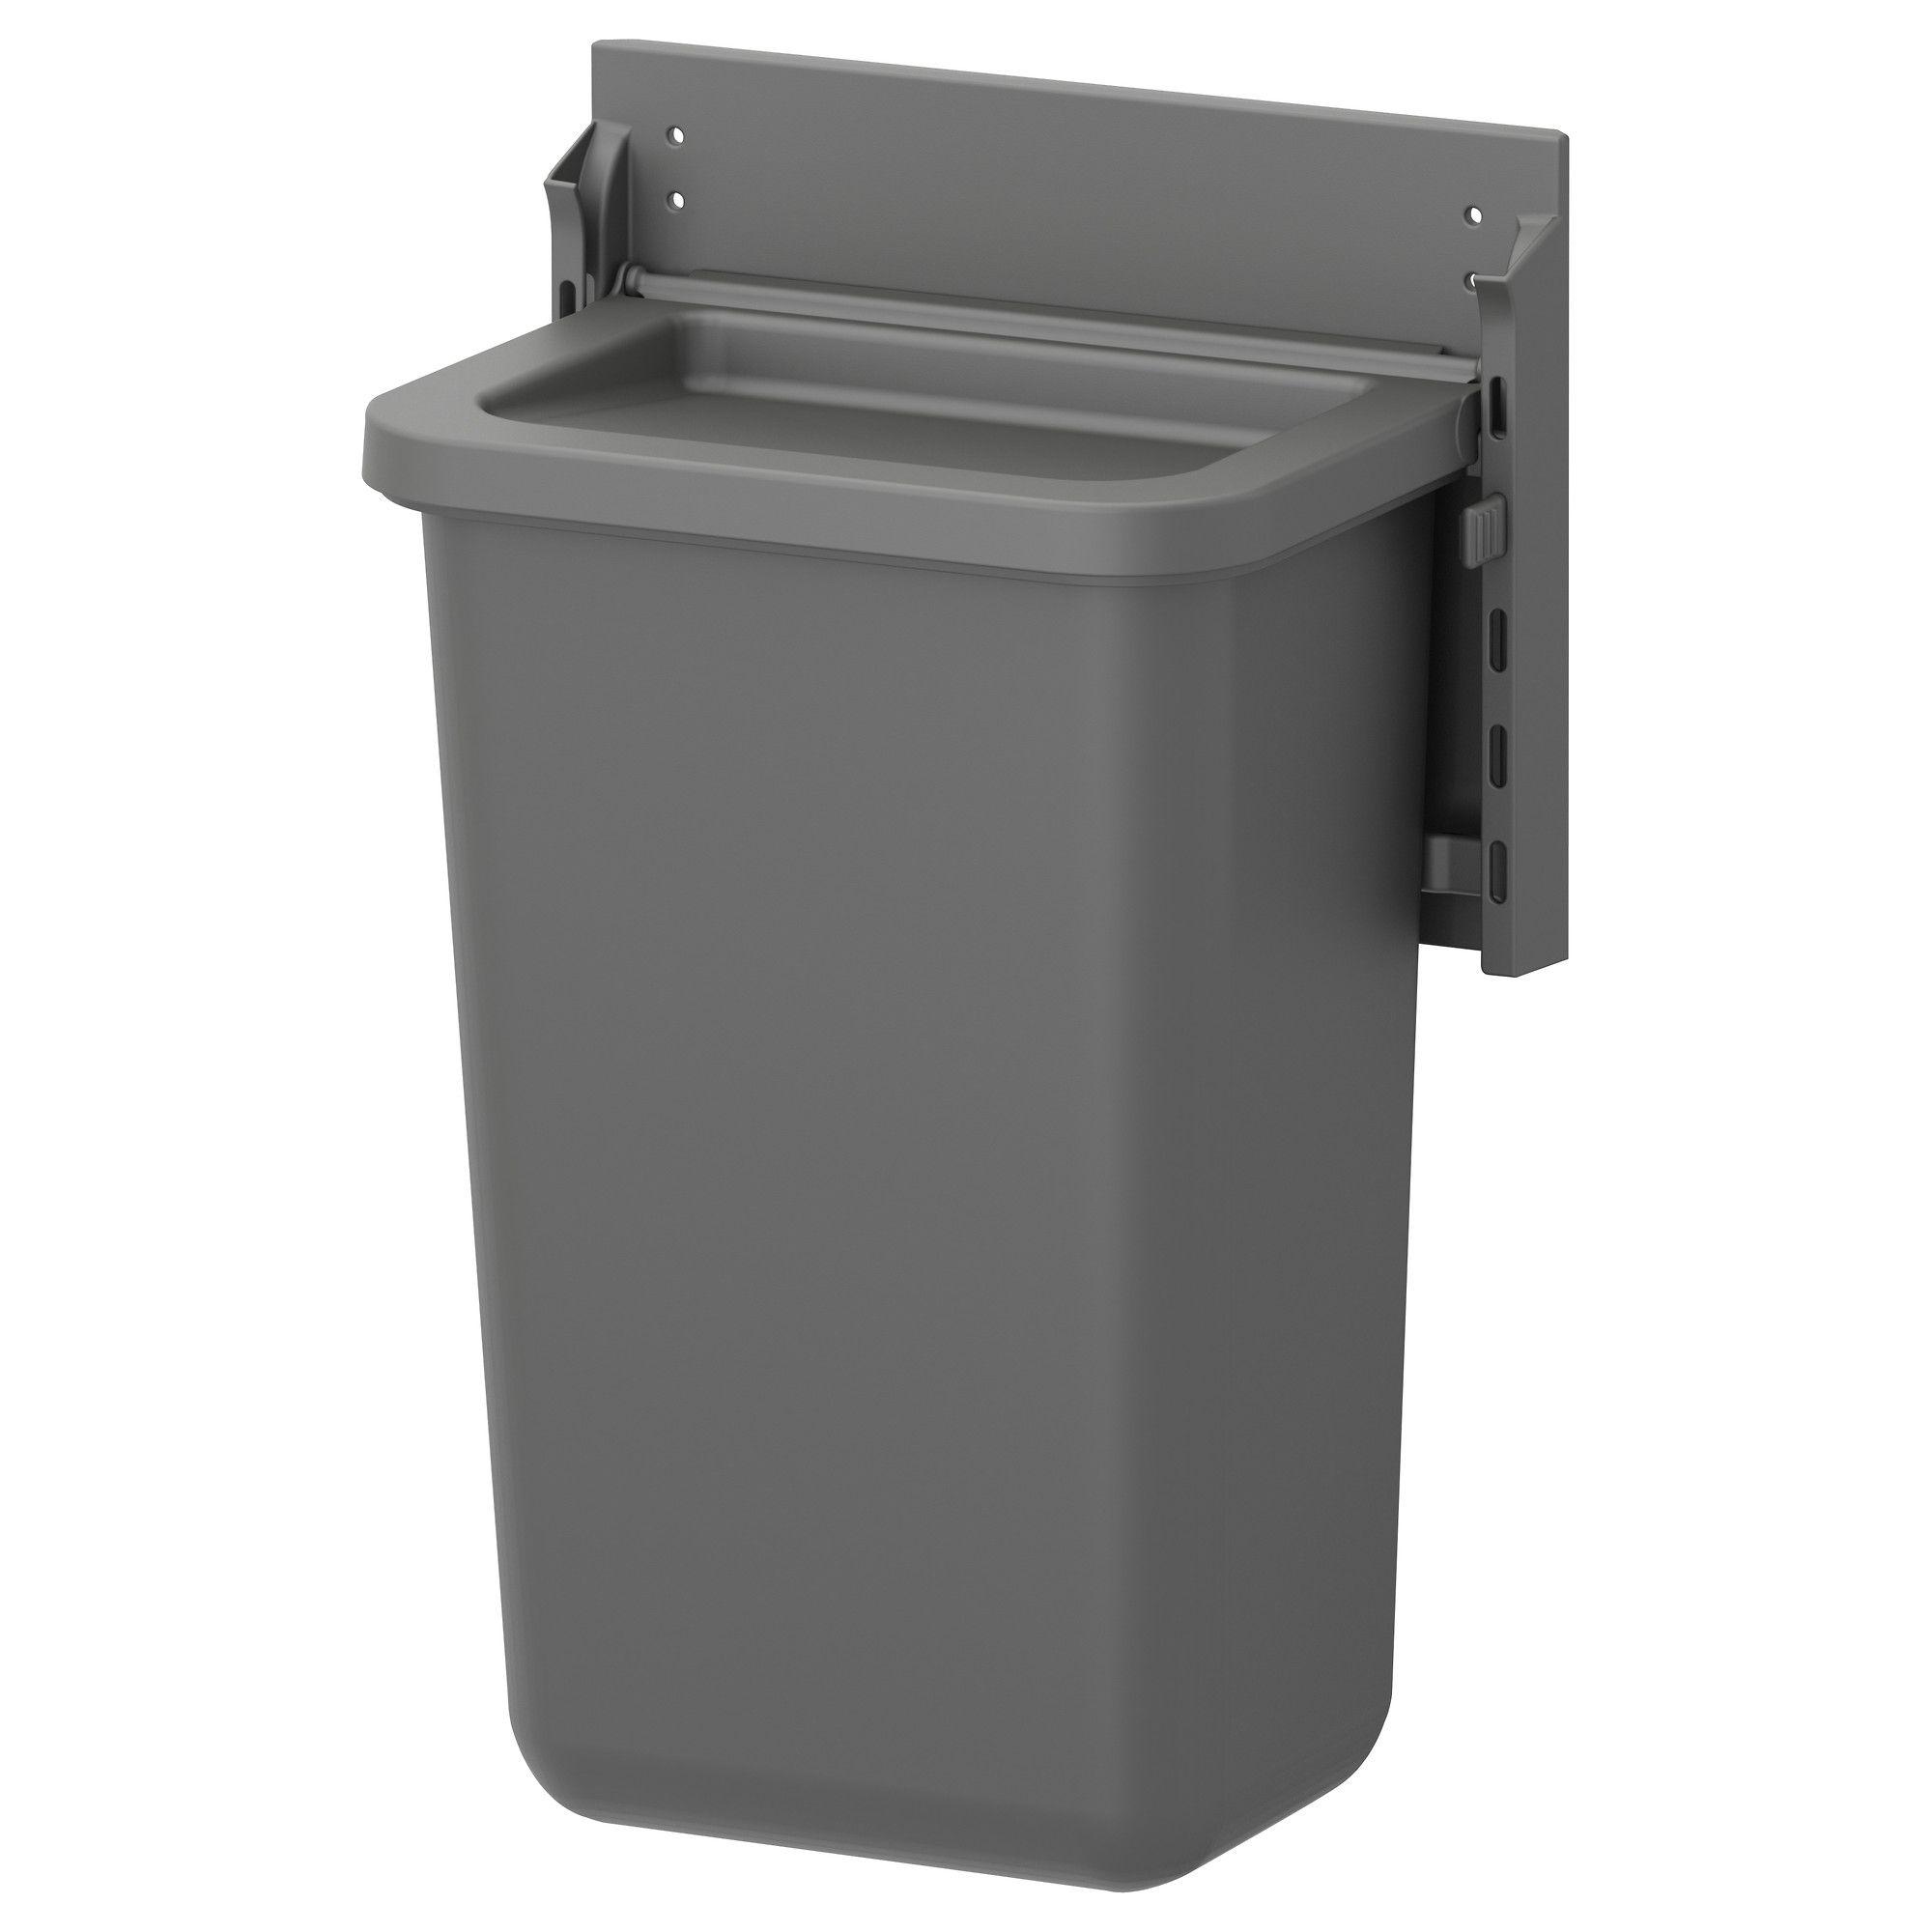 rationell kompostbehälter 7,99 preise sind in €, inkl